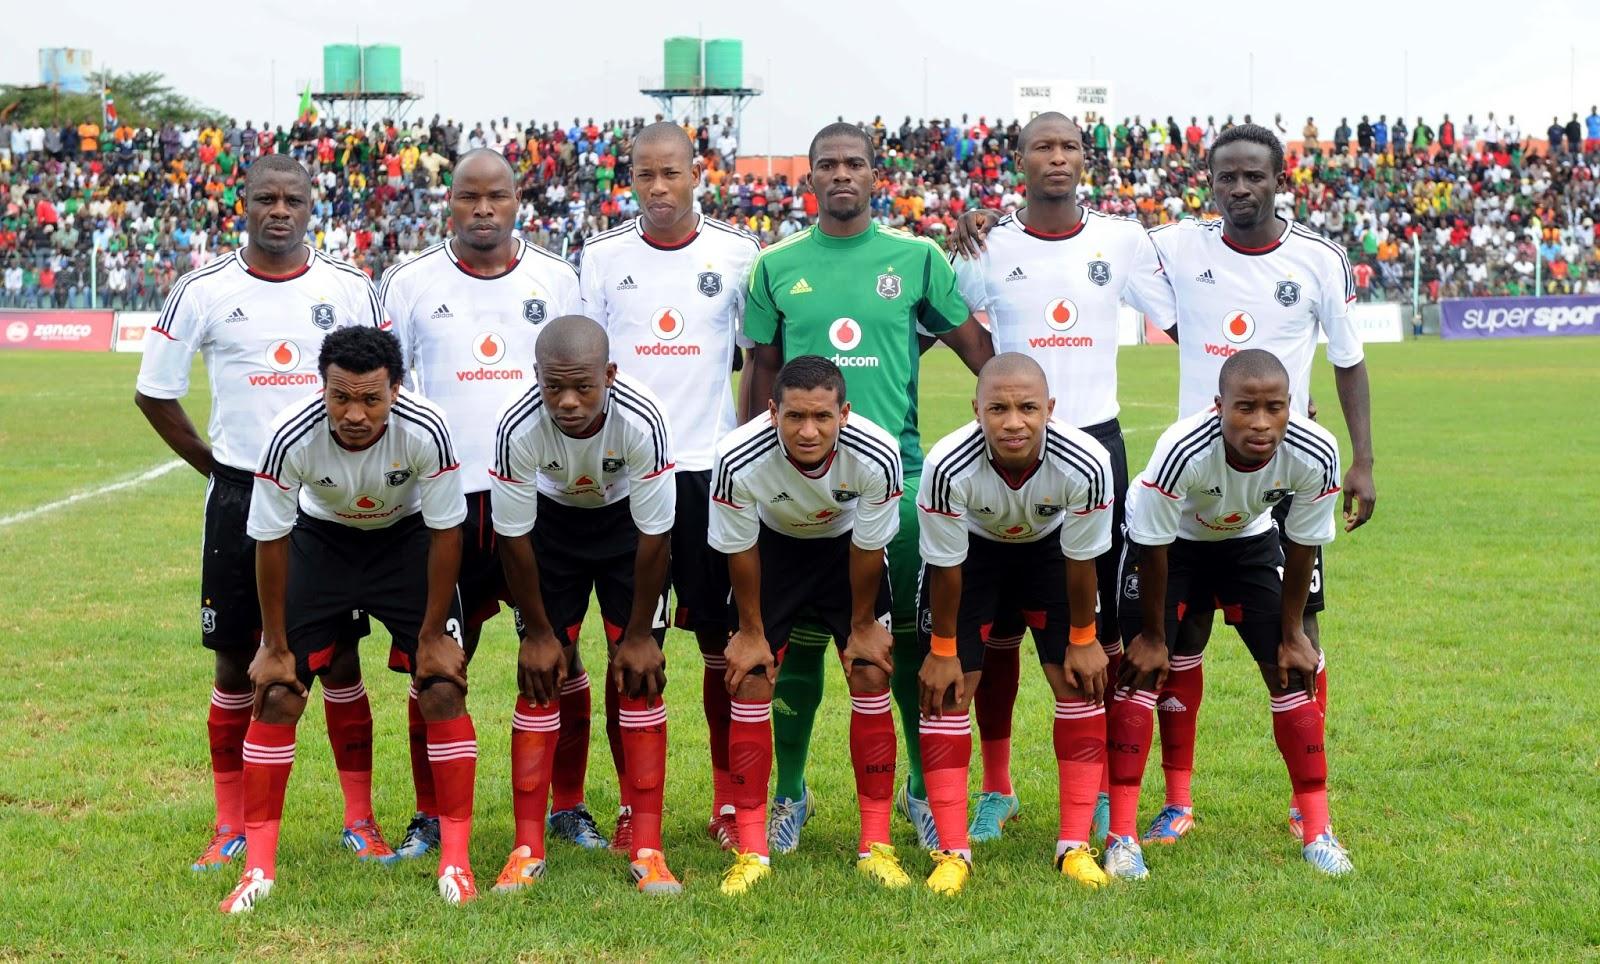 Orlando Pirates' drive to CAF Champions League | DISKIOFF